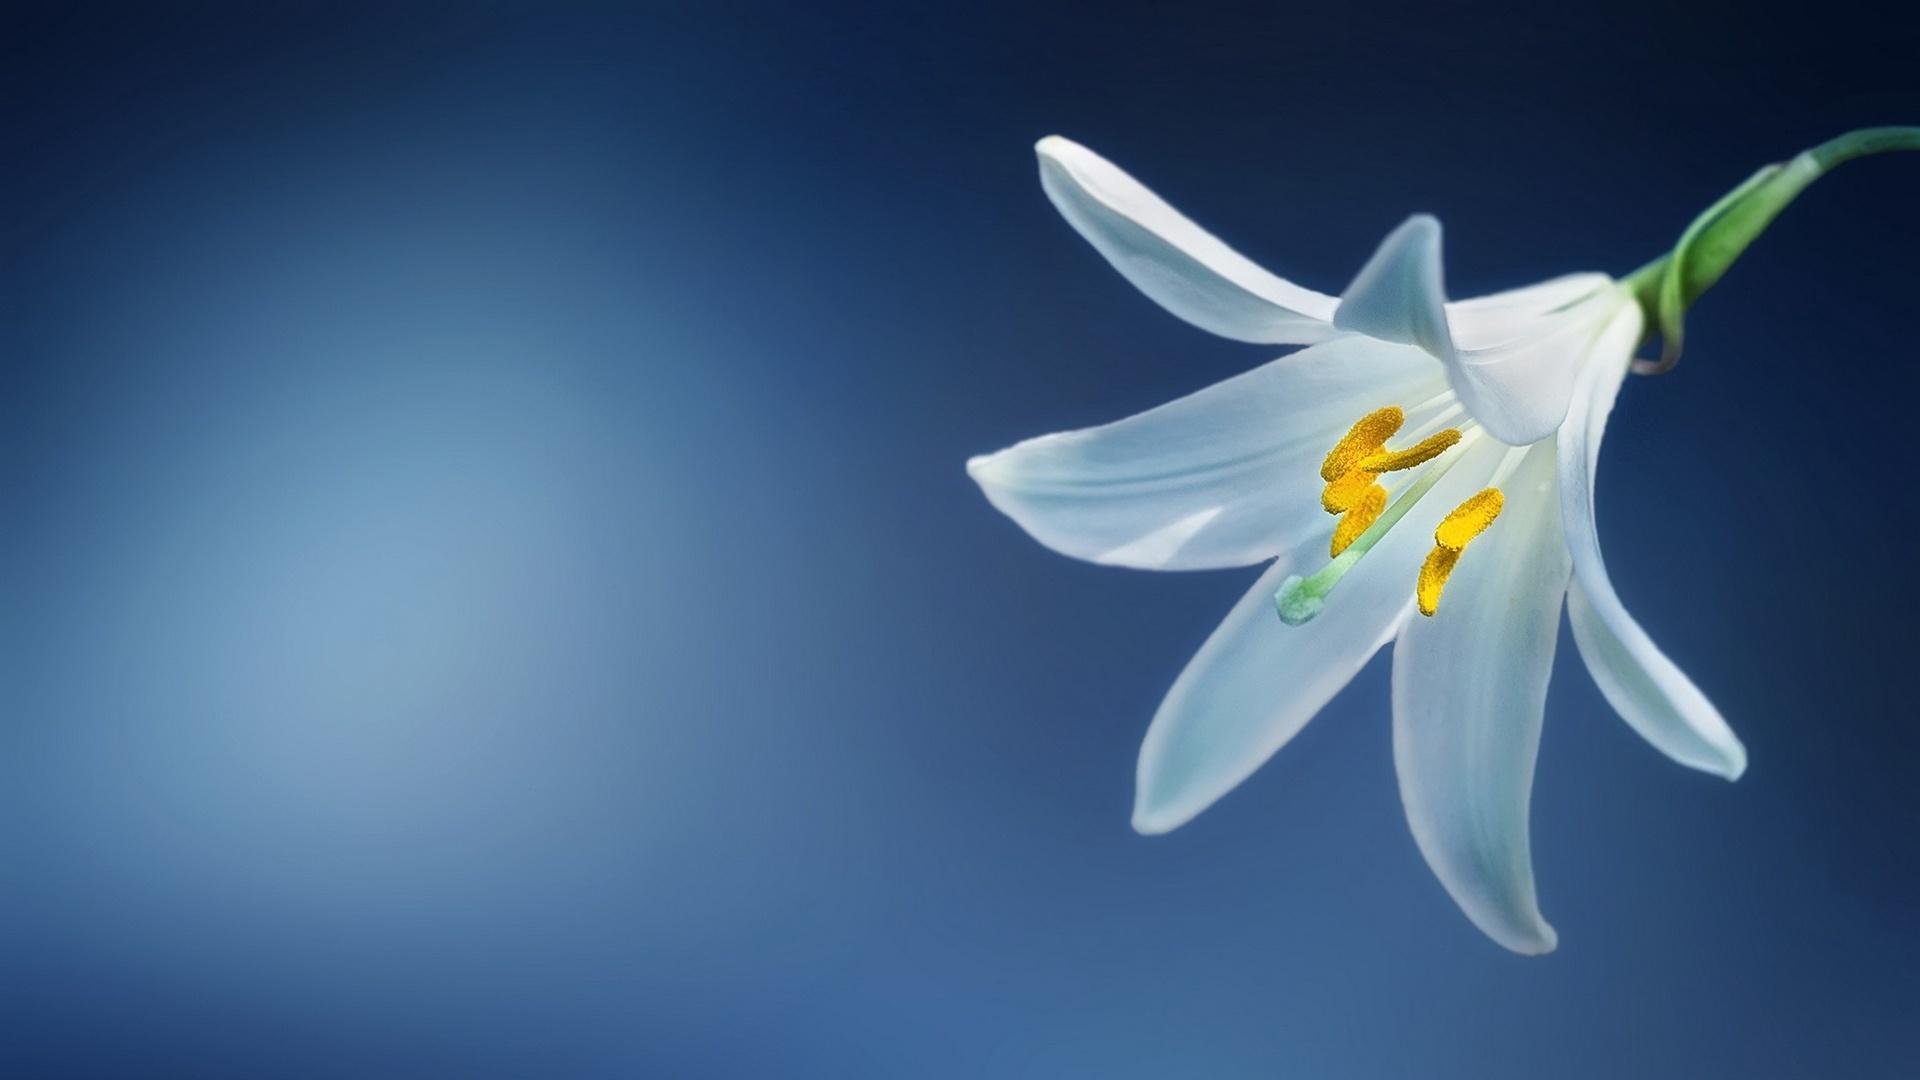 Lily Flower Wallpaper theme